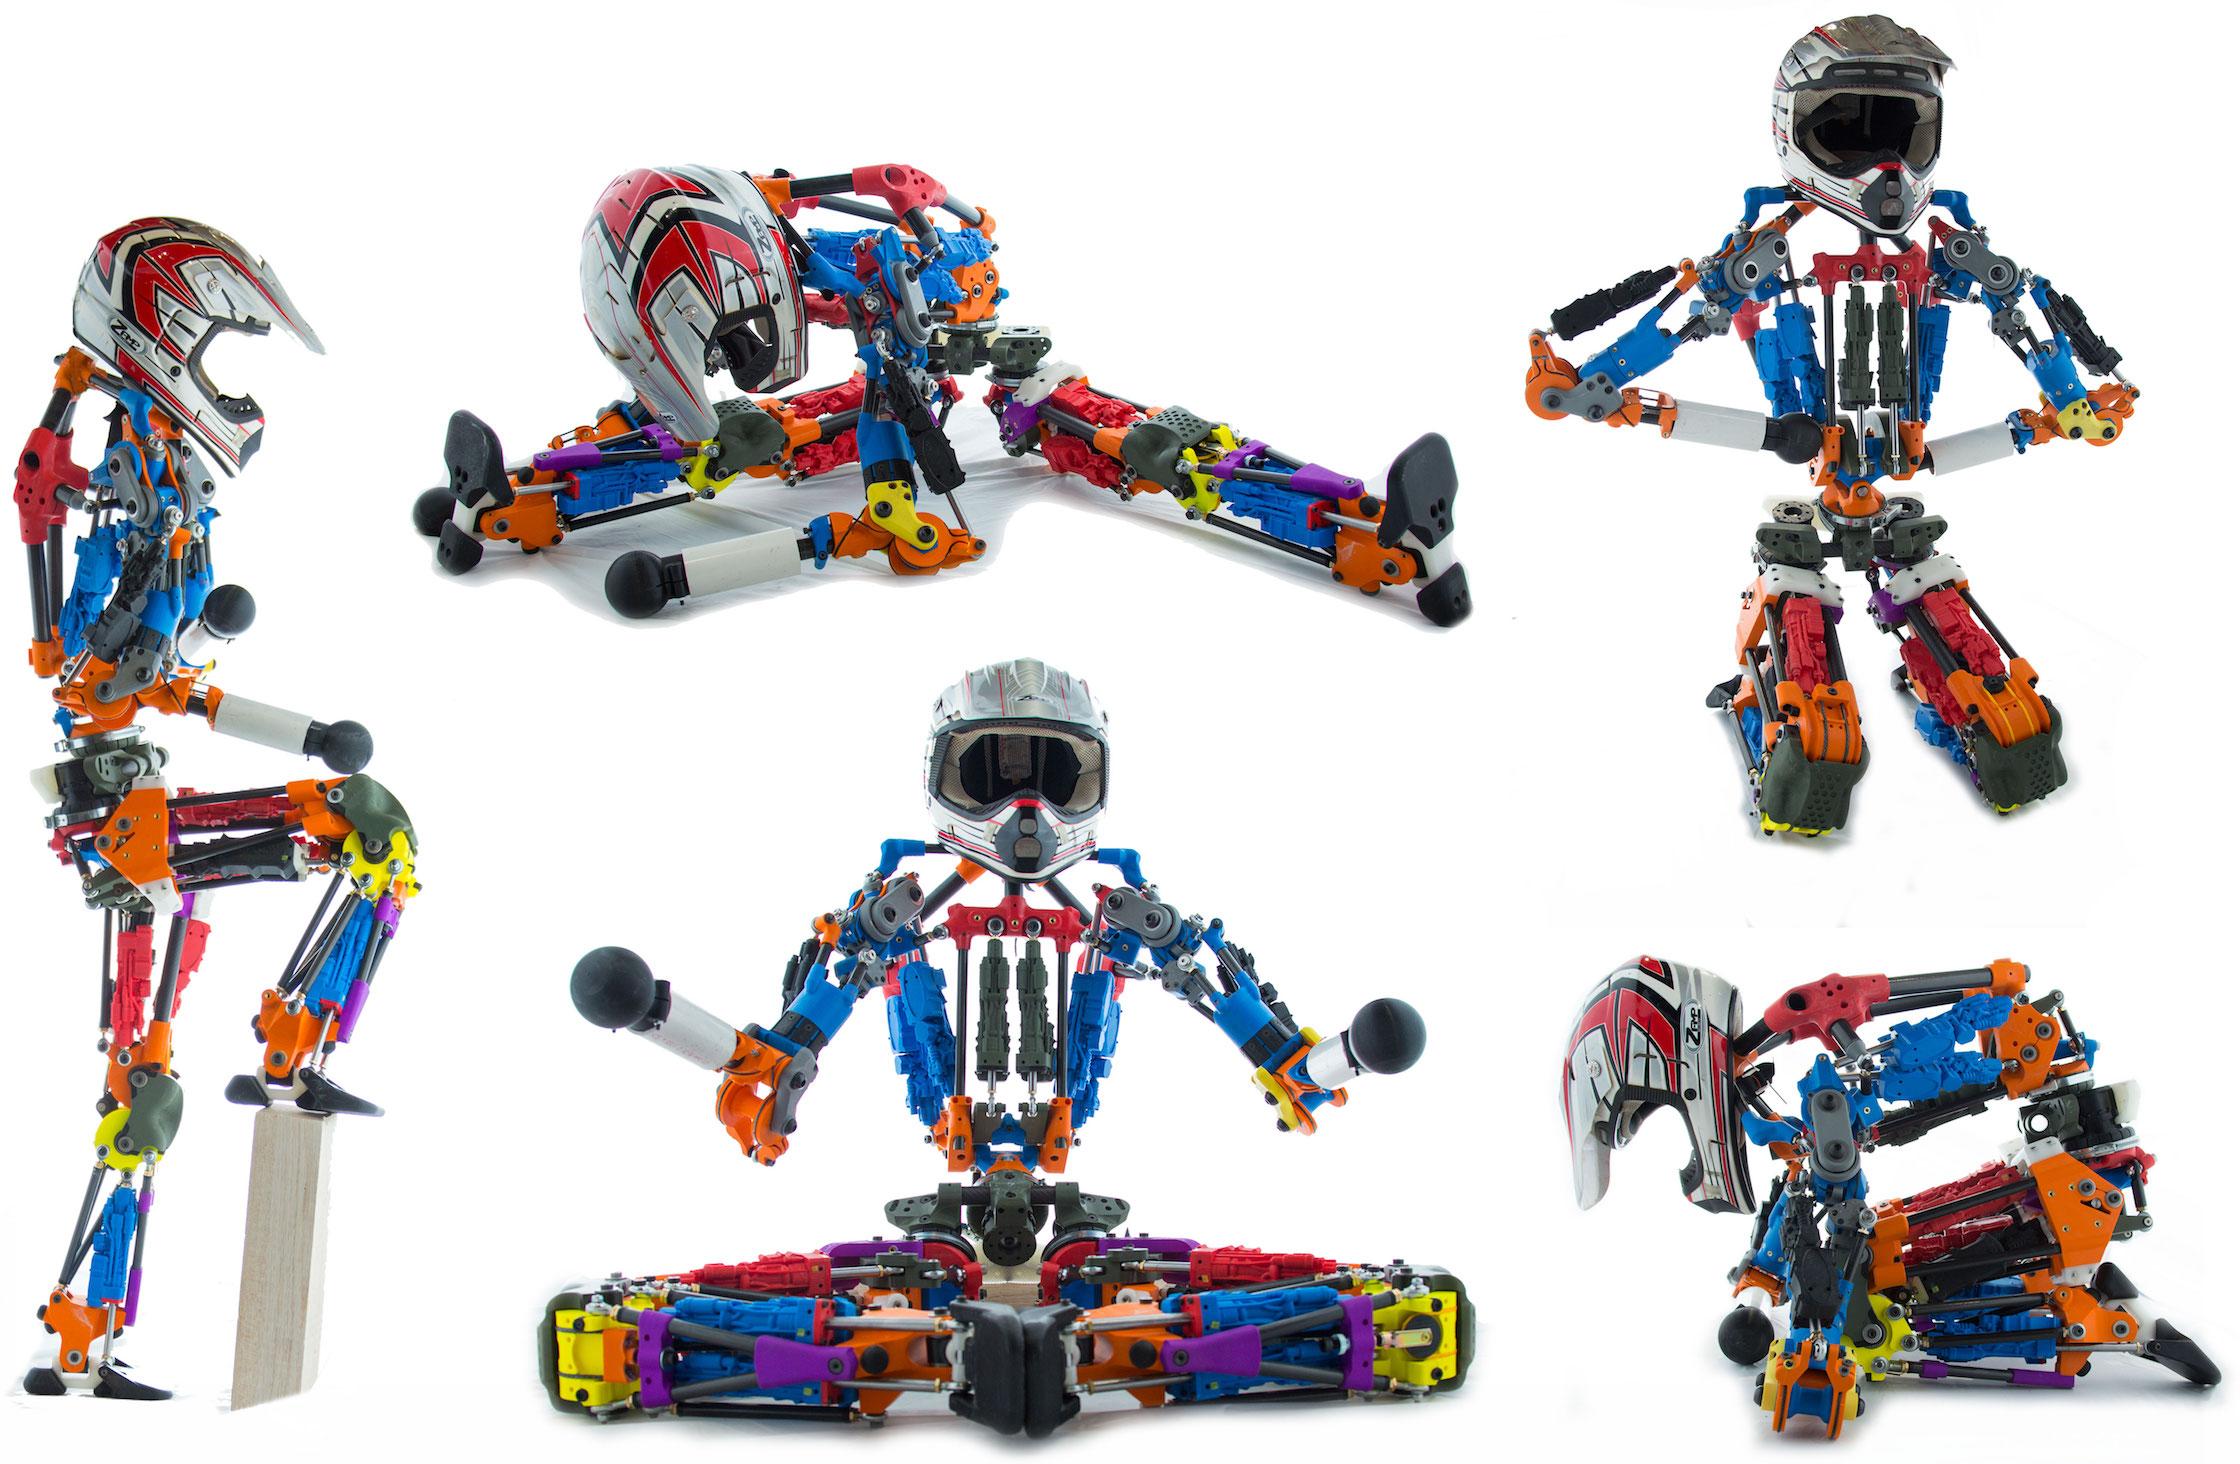 What's New In Robotics? 15.03.2019